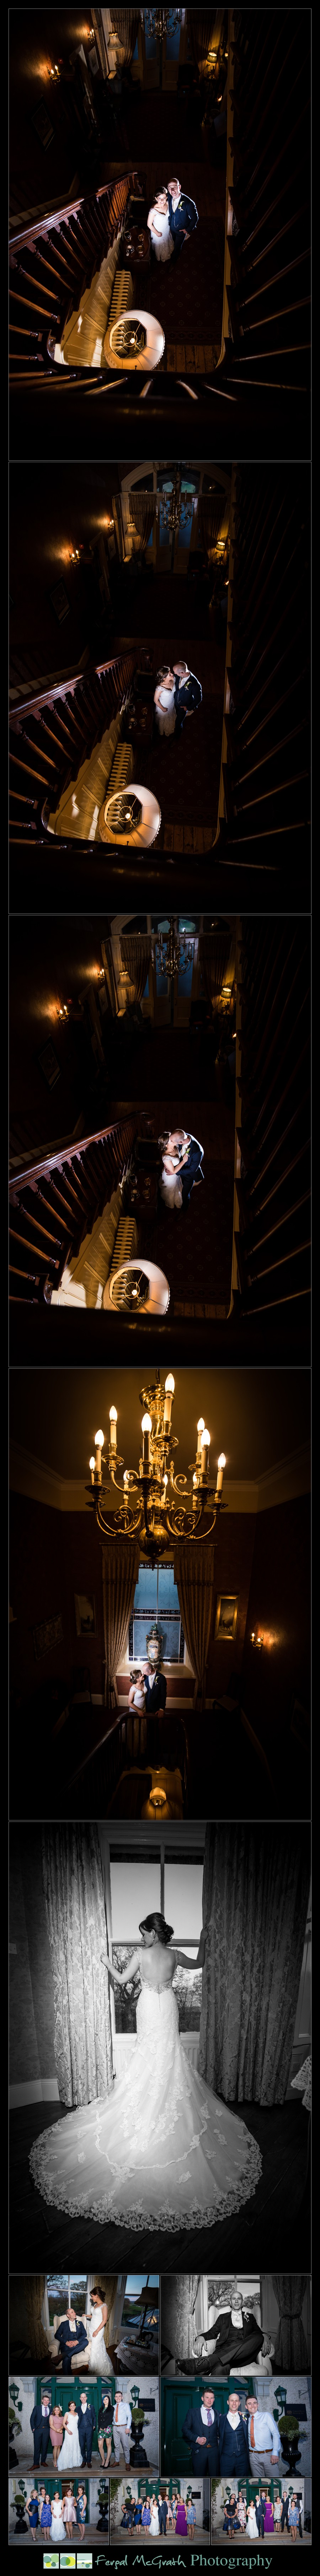 Corick House Hotel Wedding stunning creative wedding photos